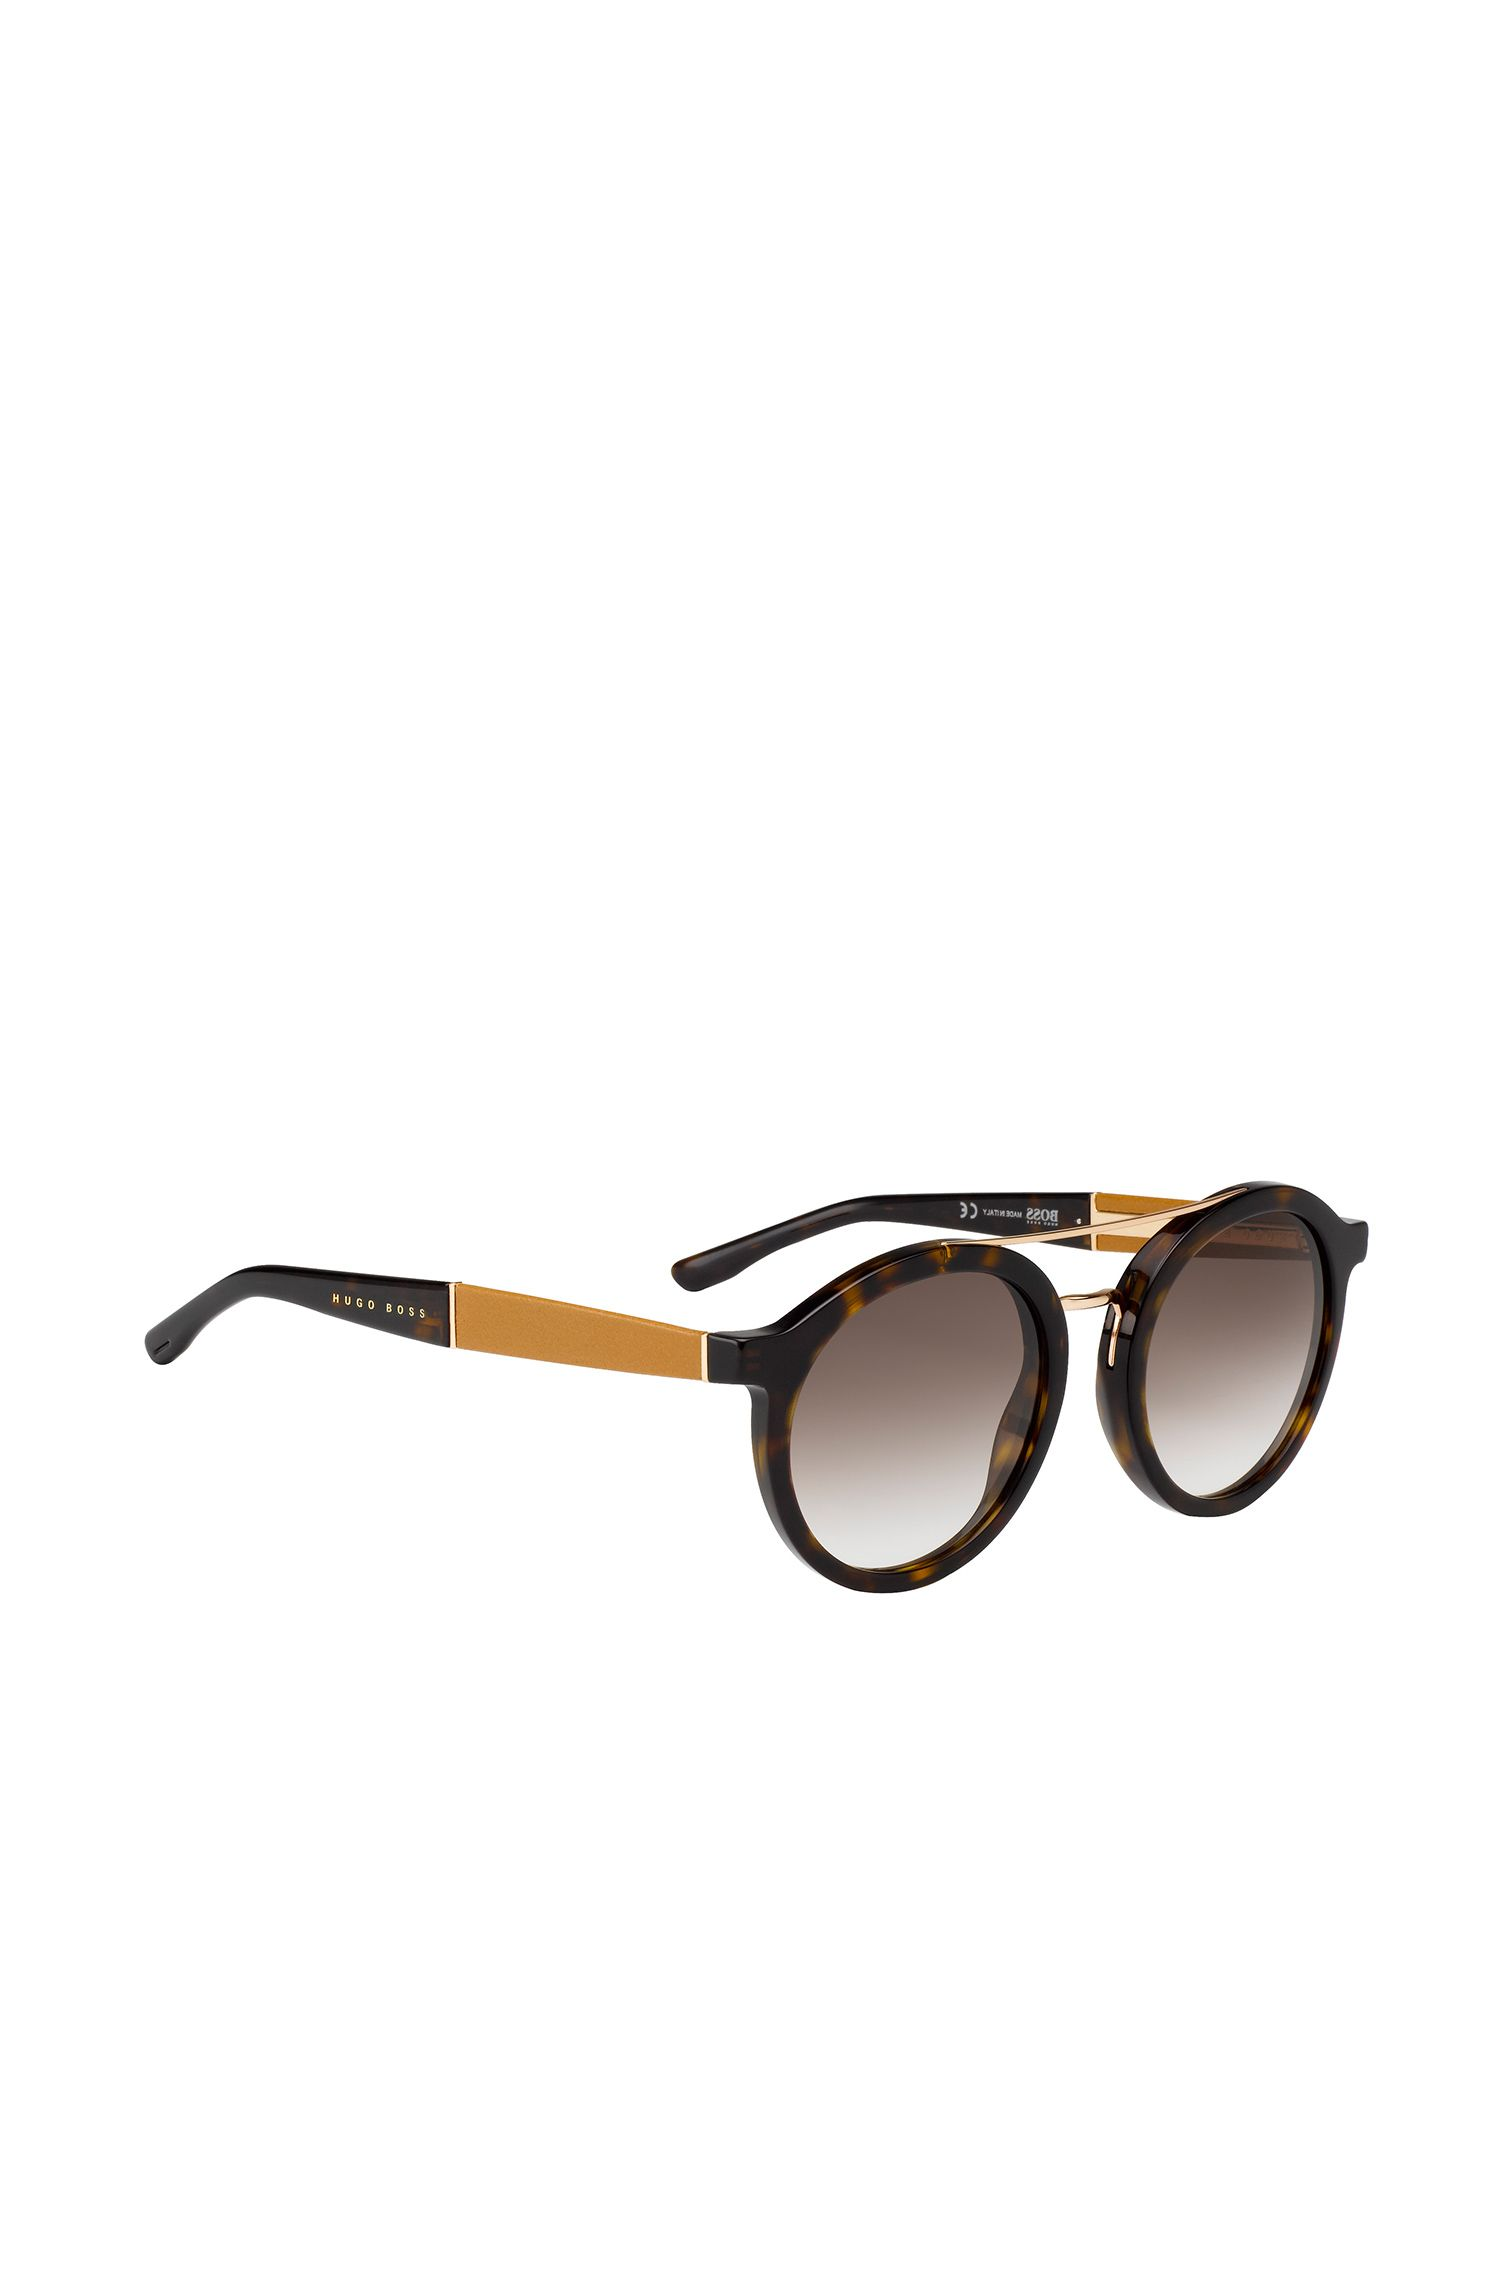 'BOSS 0853S' | Round Gradient Lens Acetate Leather Sunglasses